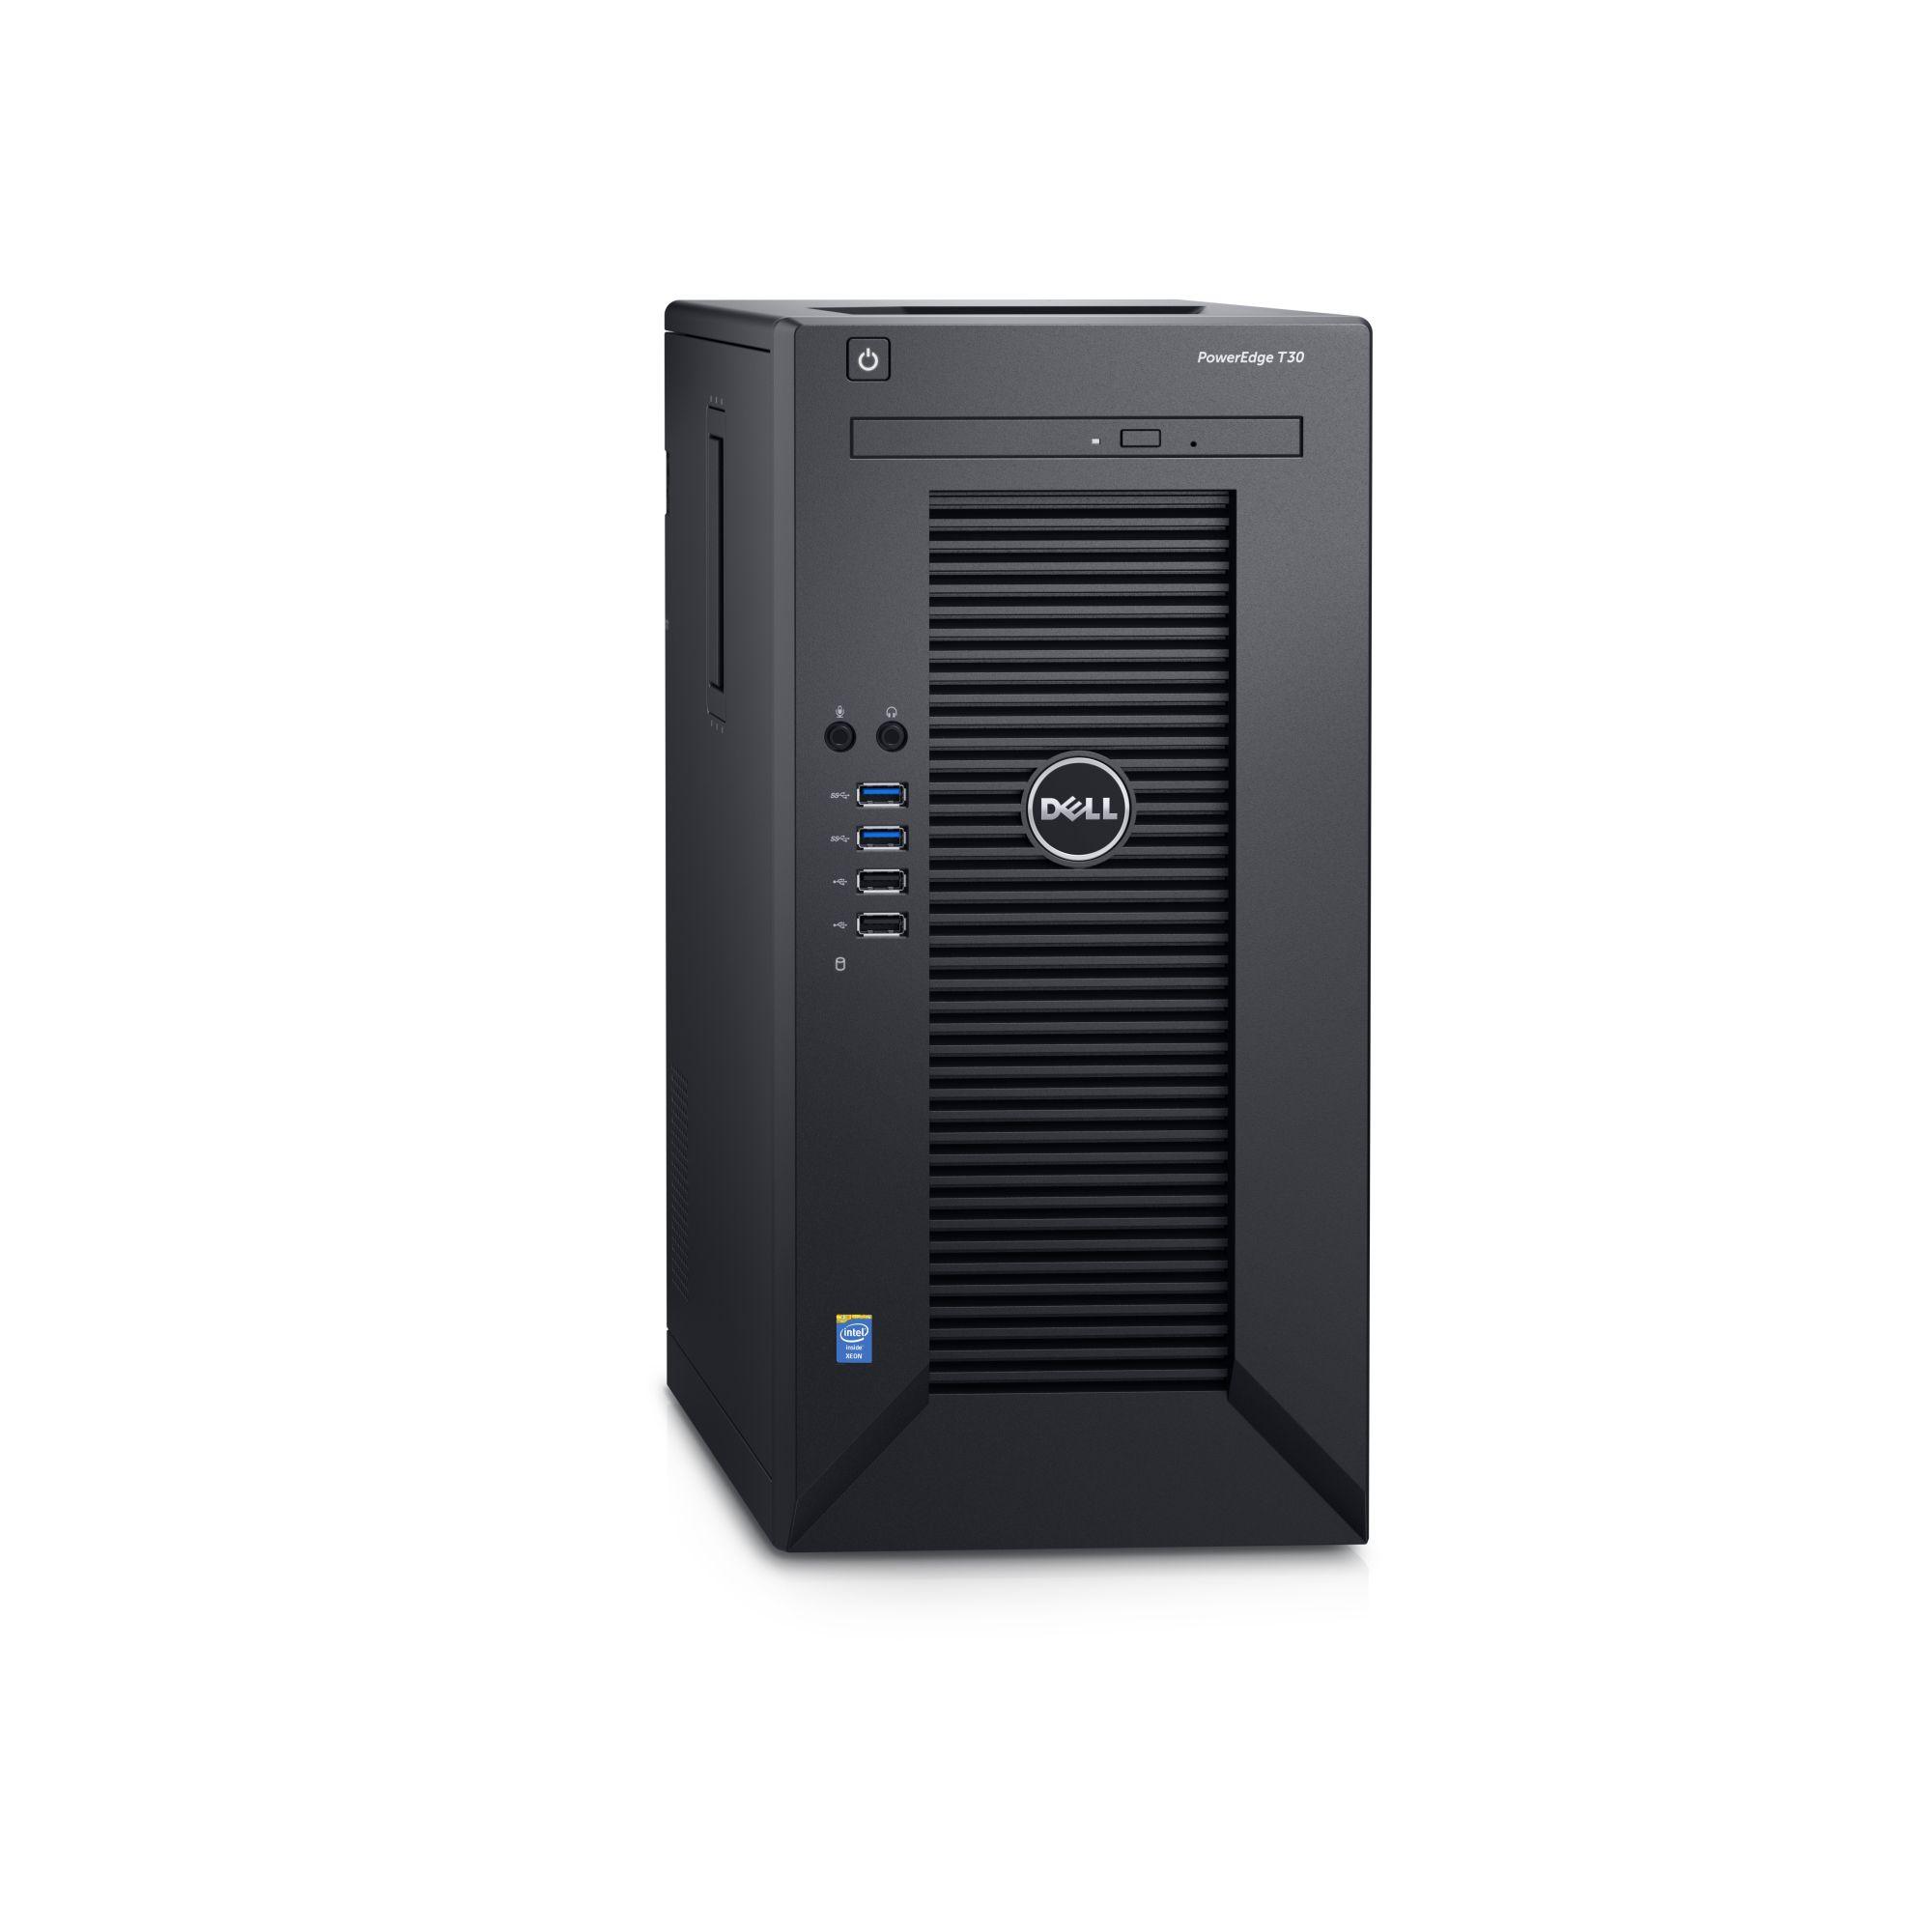 Dell PowerEdge T30 E3-1225 v5/16GB/4x2TB SATA/RAID 5/DVDRW/1xGLAN/290W/3RNBD/Černý